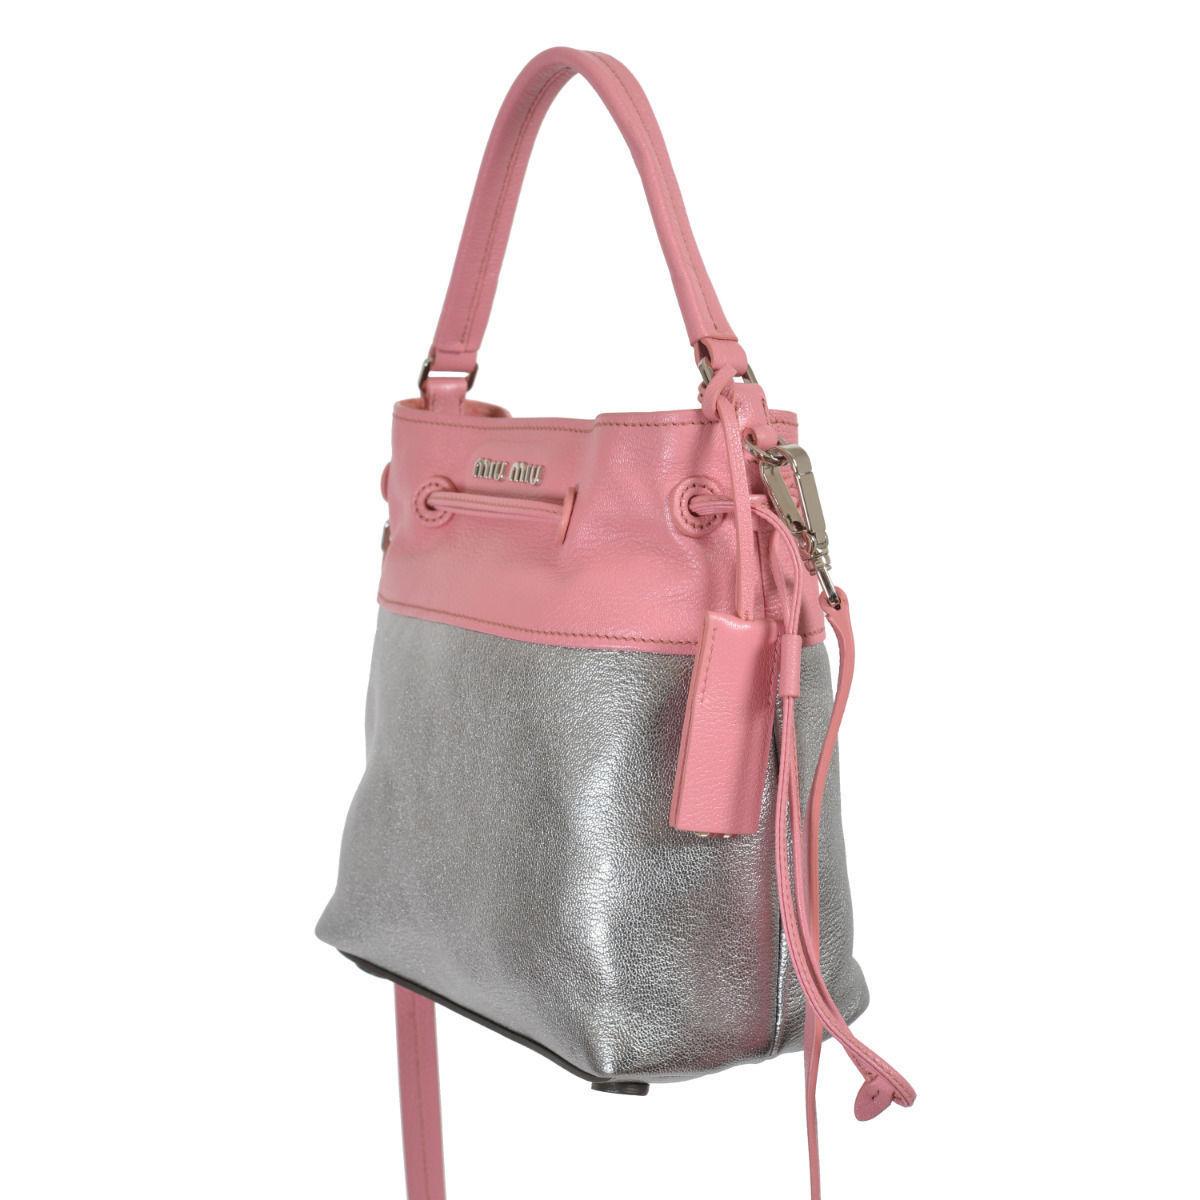 Miu Miu Women's Two Tone Leather Bucket Handbag Shoulder Bag 4